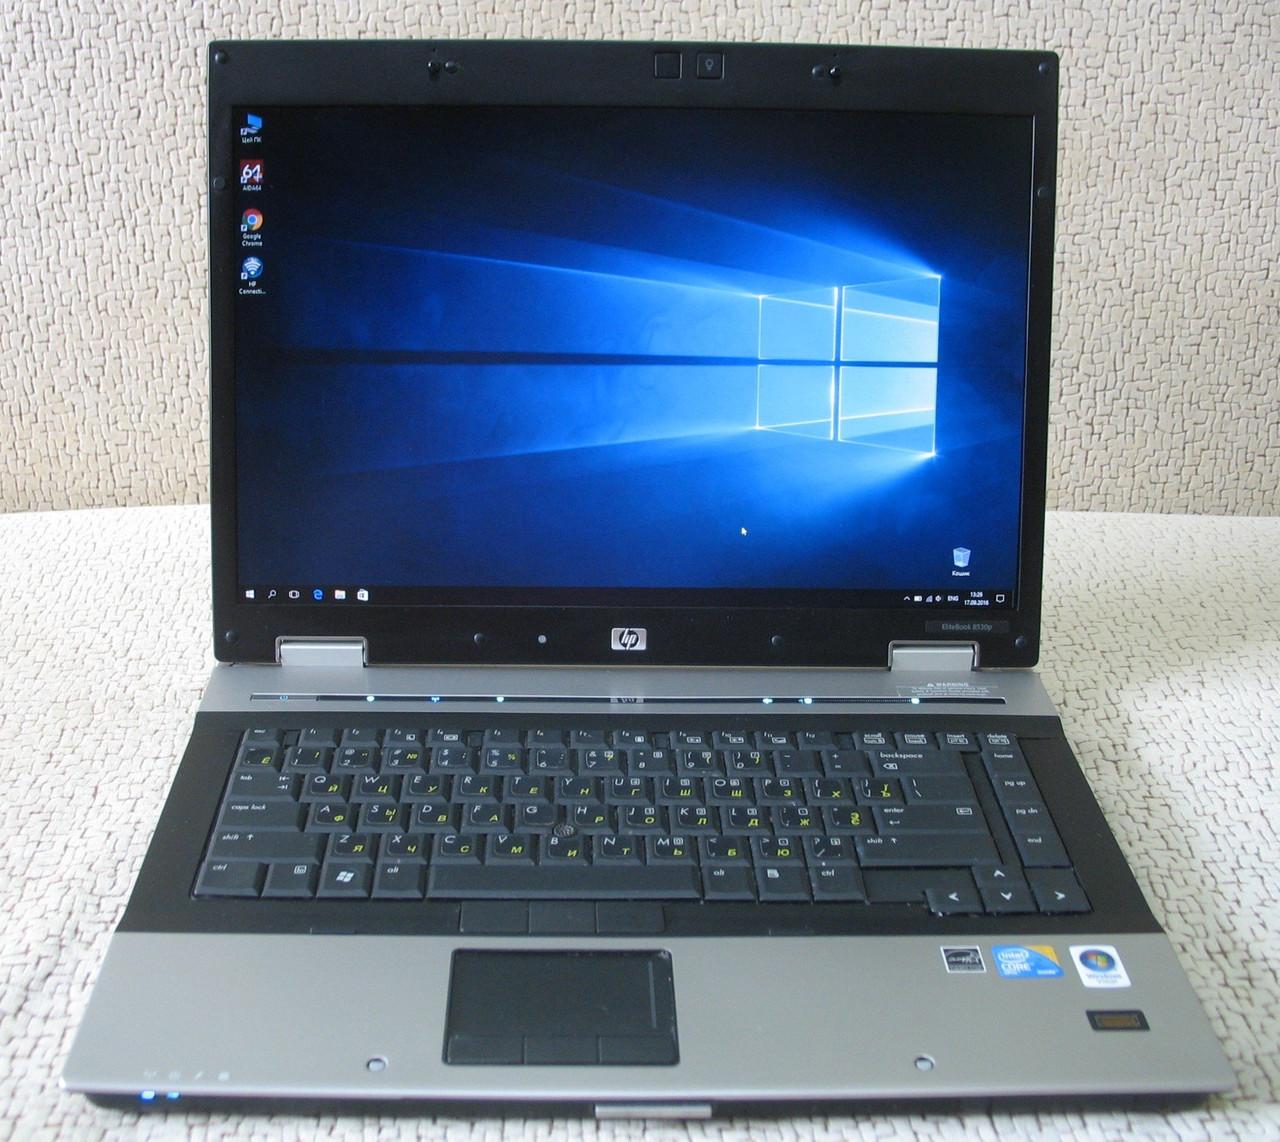 Ноутбук HP EliteBook 8530p 1680х1050/C2D/4/160/3g